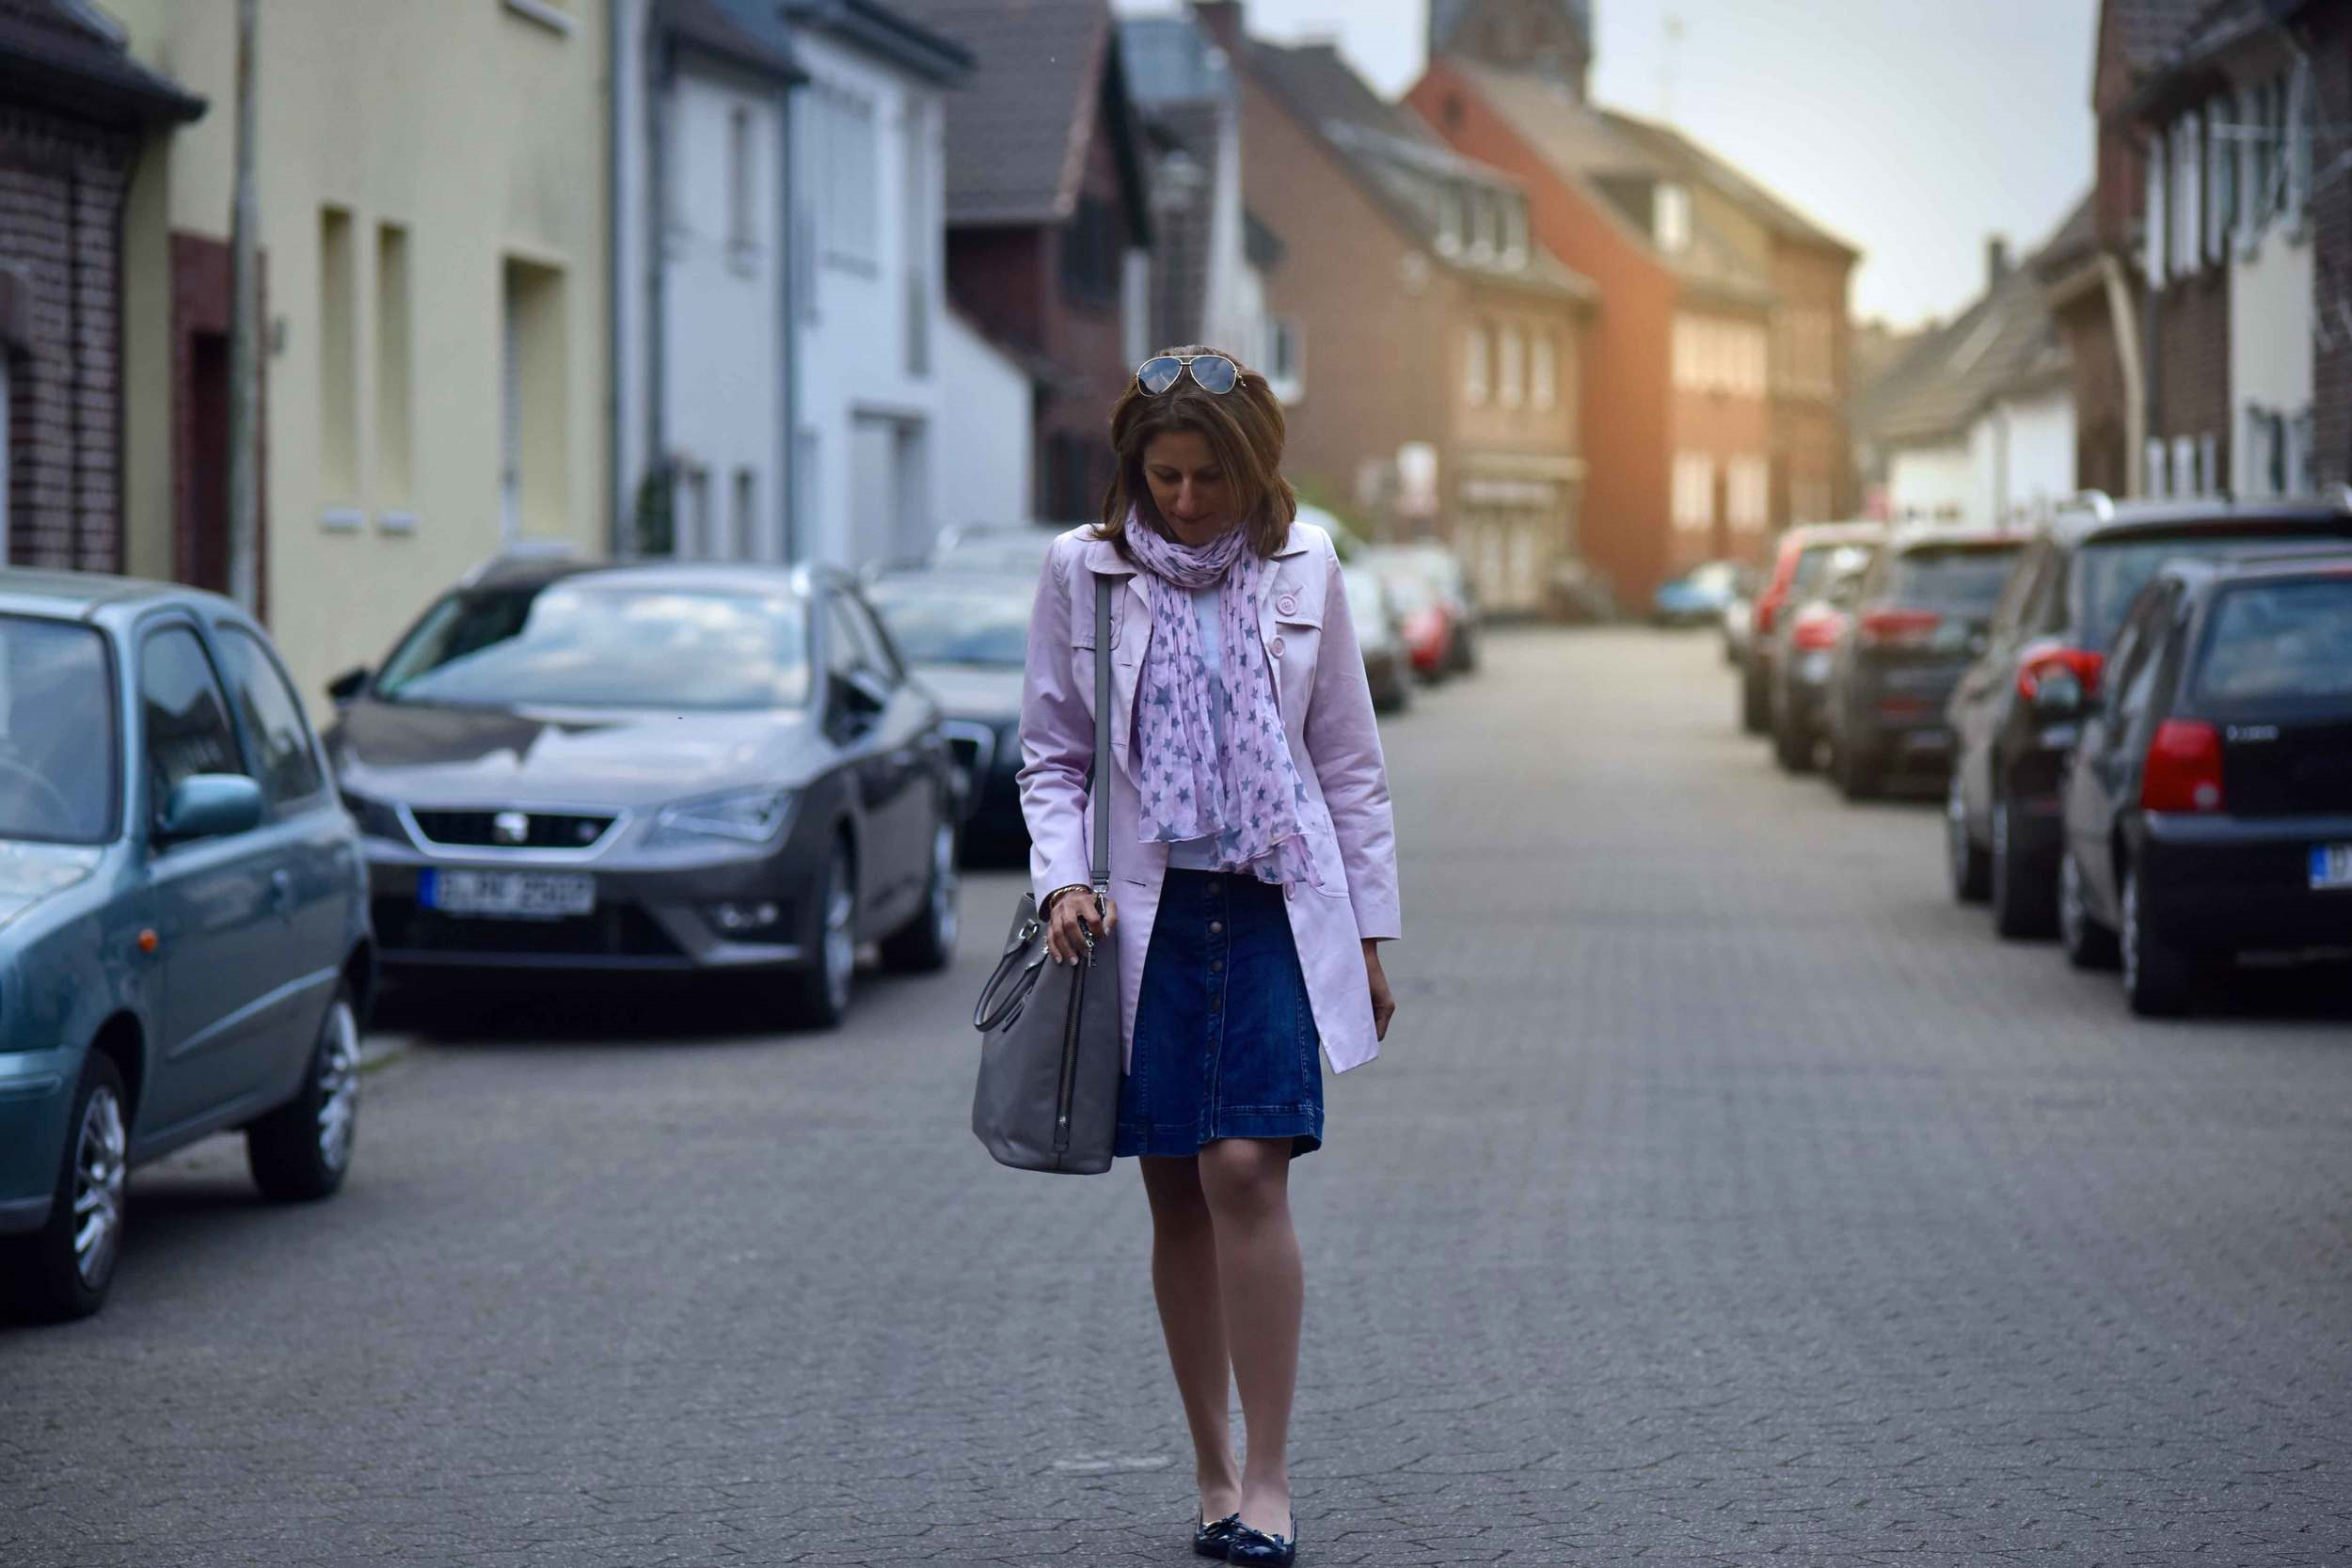 Walking back home, village near Düsseldorf, Germany, pink trench, Ralph Lauren white tee, star scarf, Prada tote, Gucci sunglasses. Photo: Nicola Nolting, Image©sourcingstyle.com